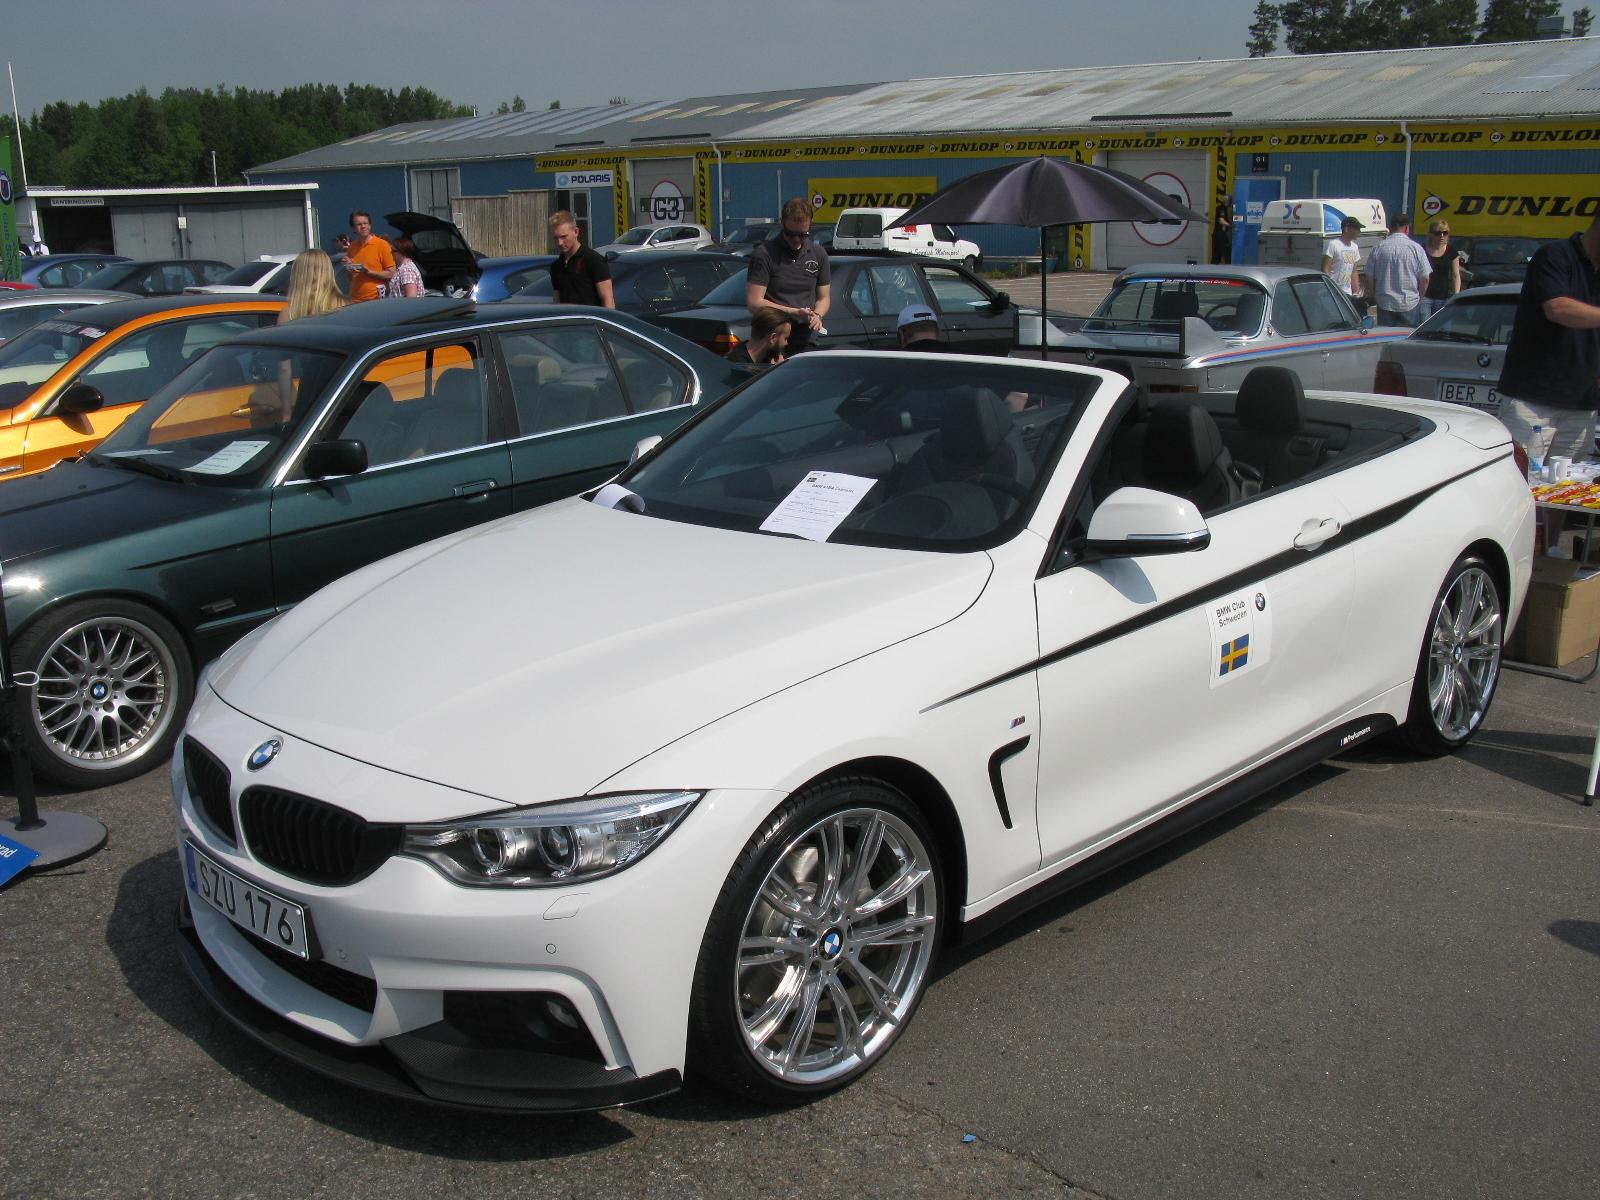 File Bmw 435i Cabriolet M Sport F33 14321046911 Jpg ǻ�基